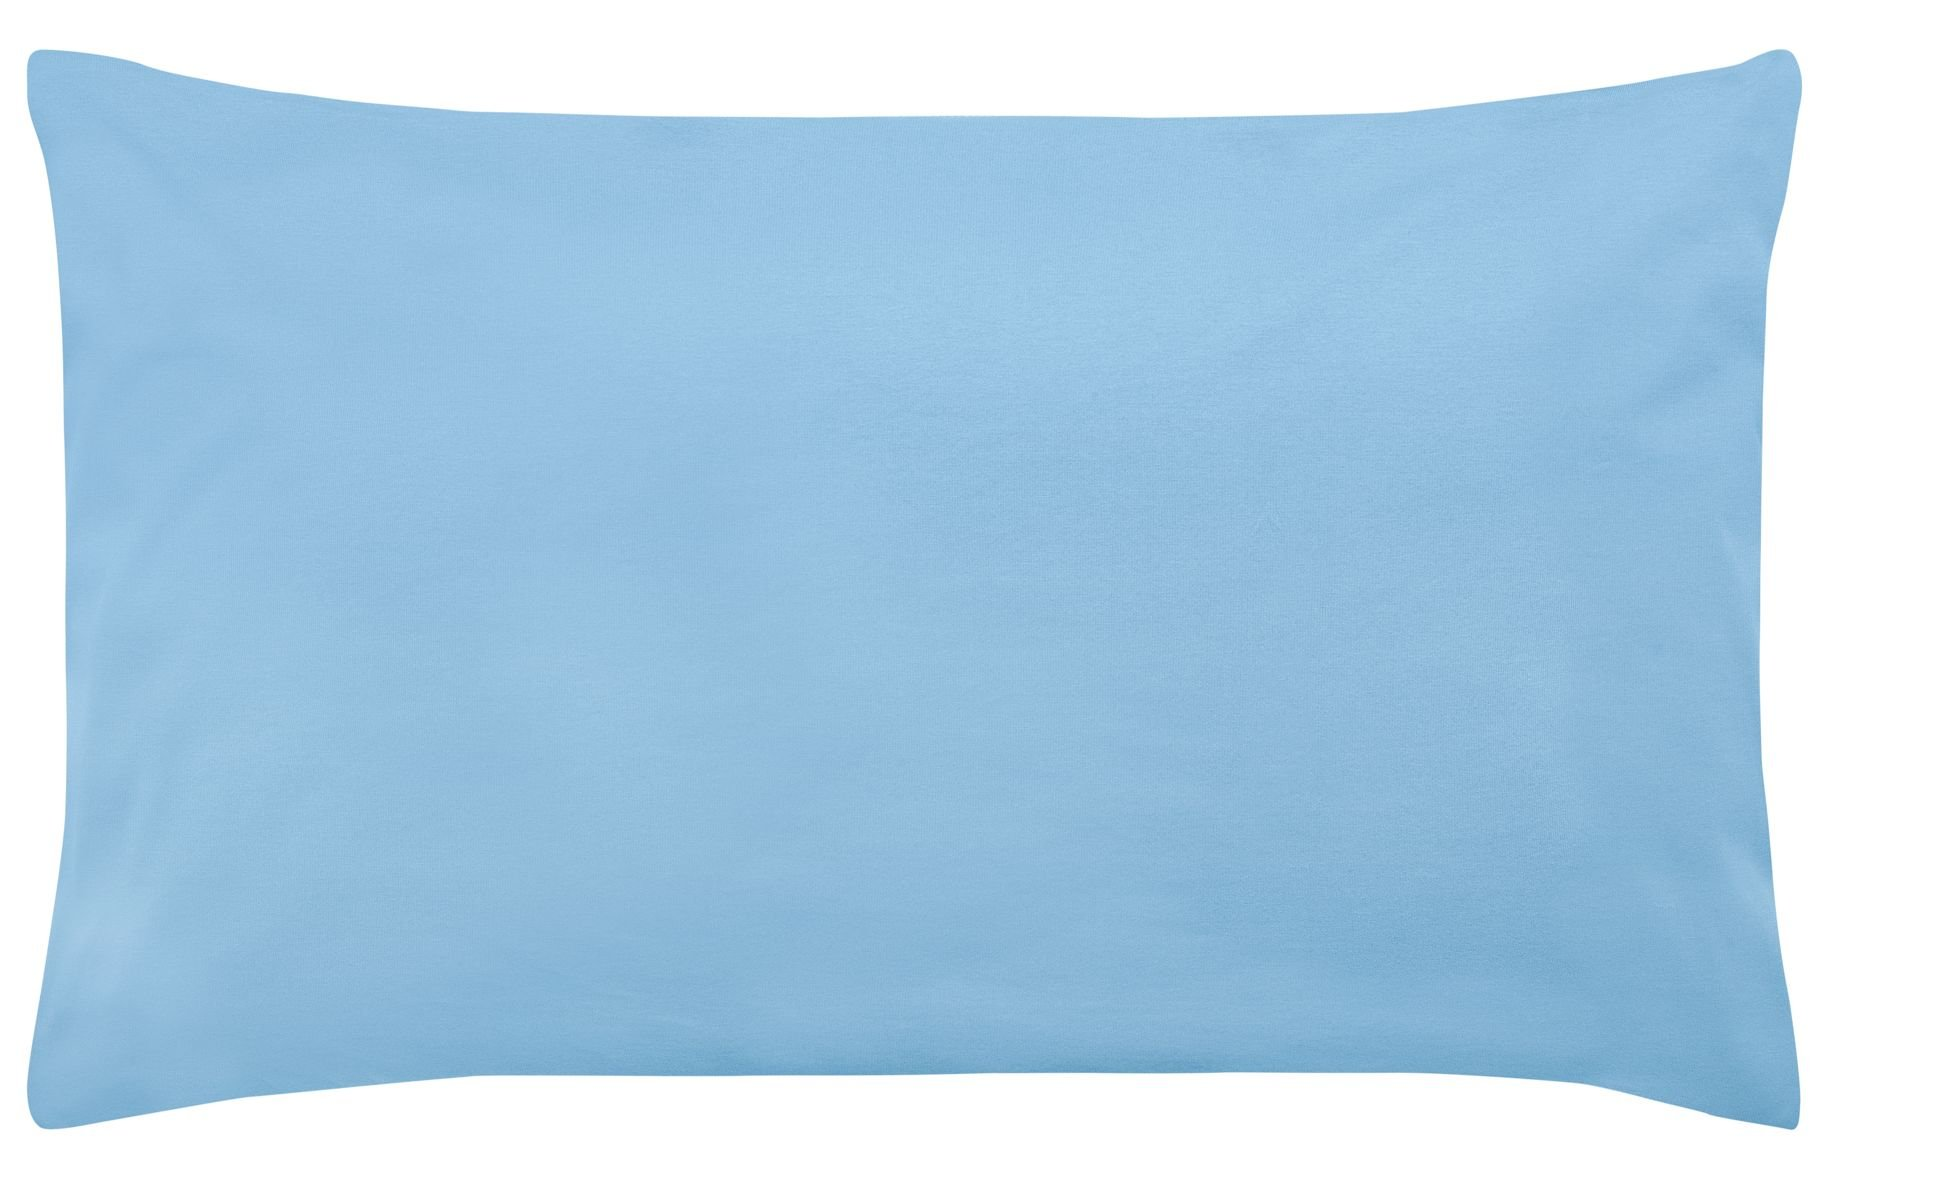 K.-Bezug hellblau 40x60cm